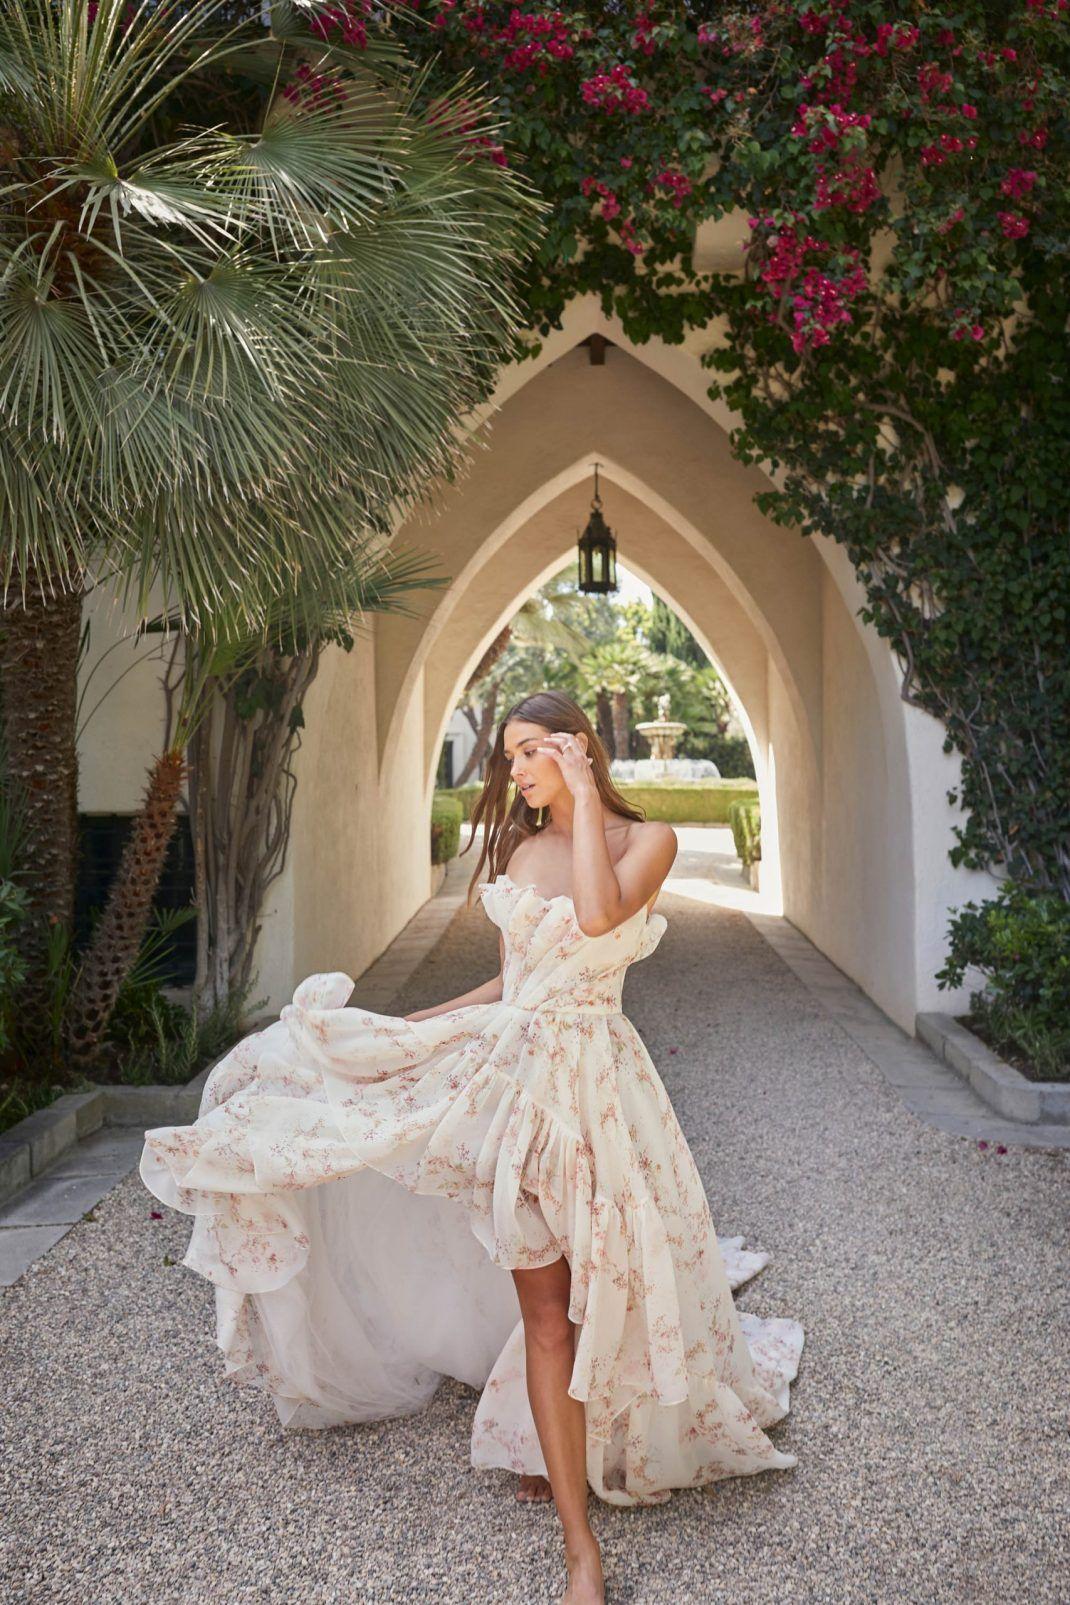 Cali Girl Aesthetic At Monique Lhuillier Wedluxe Magazine Wedding Dresses Unique Wedding Dresses Ball Gowns Wedding [ 1605 x 1070 Pixel ]